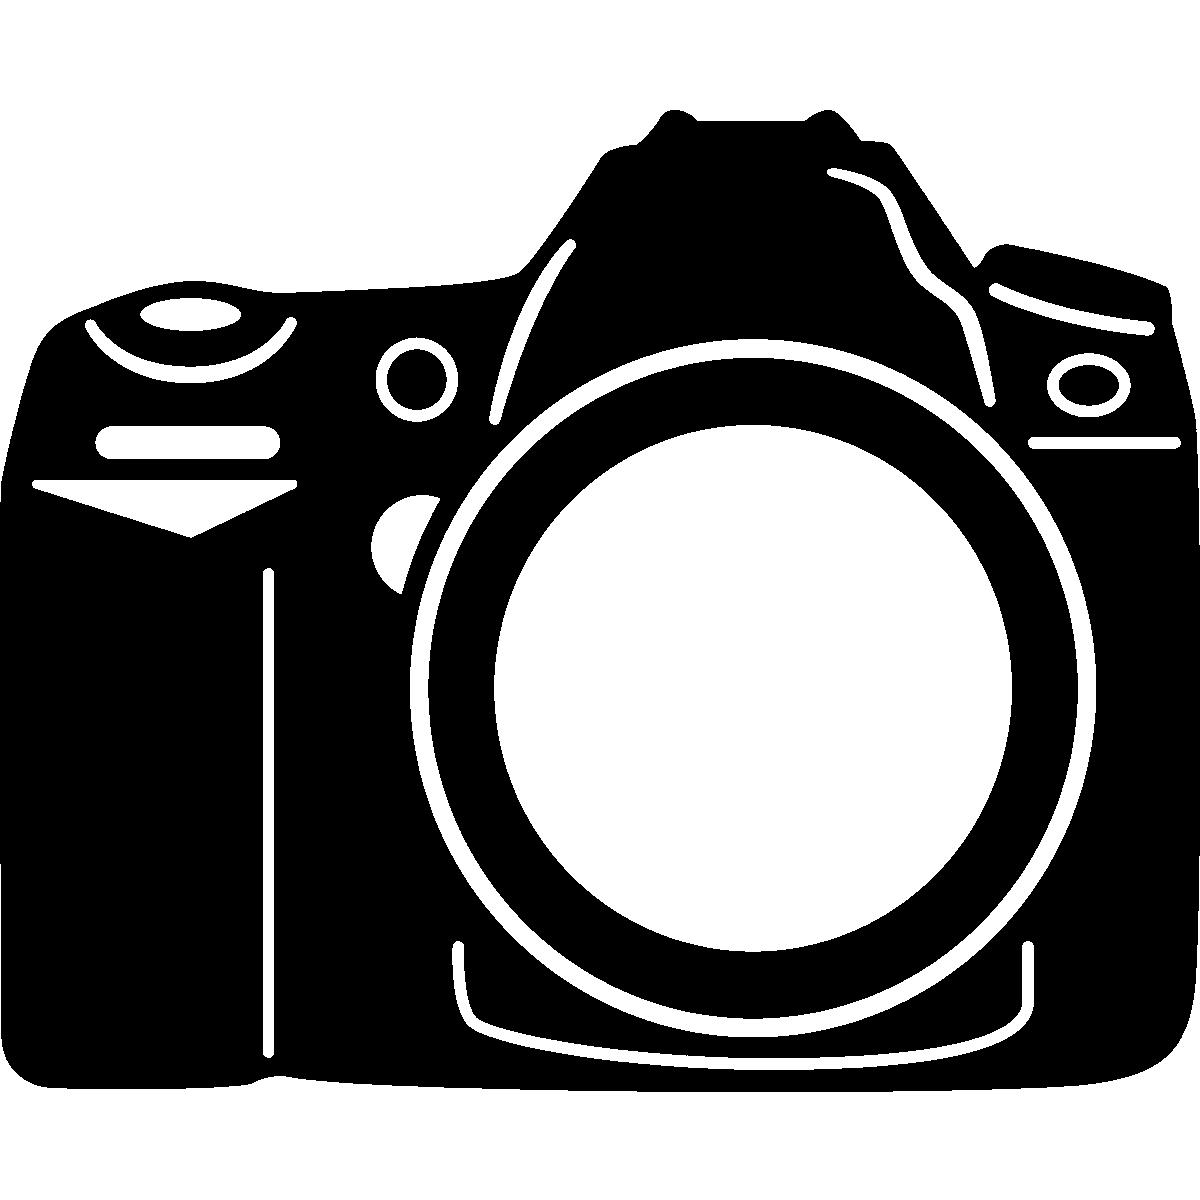 stickers ordinateurs portables sticker appareil photo pour ipad ambiance. Black Bedroom Furniture Sets. Home Design Ideas